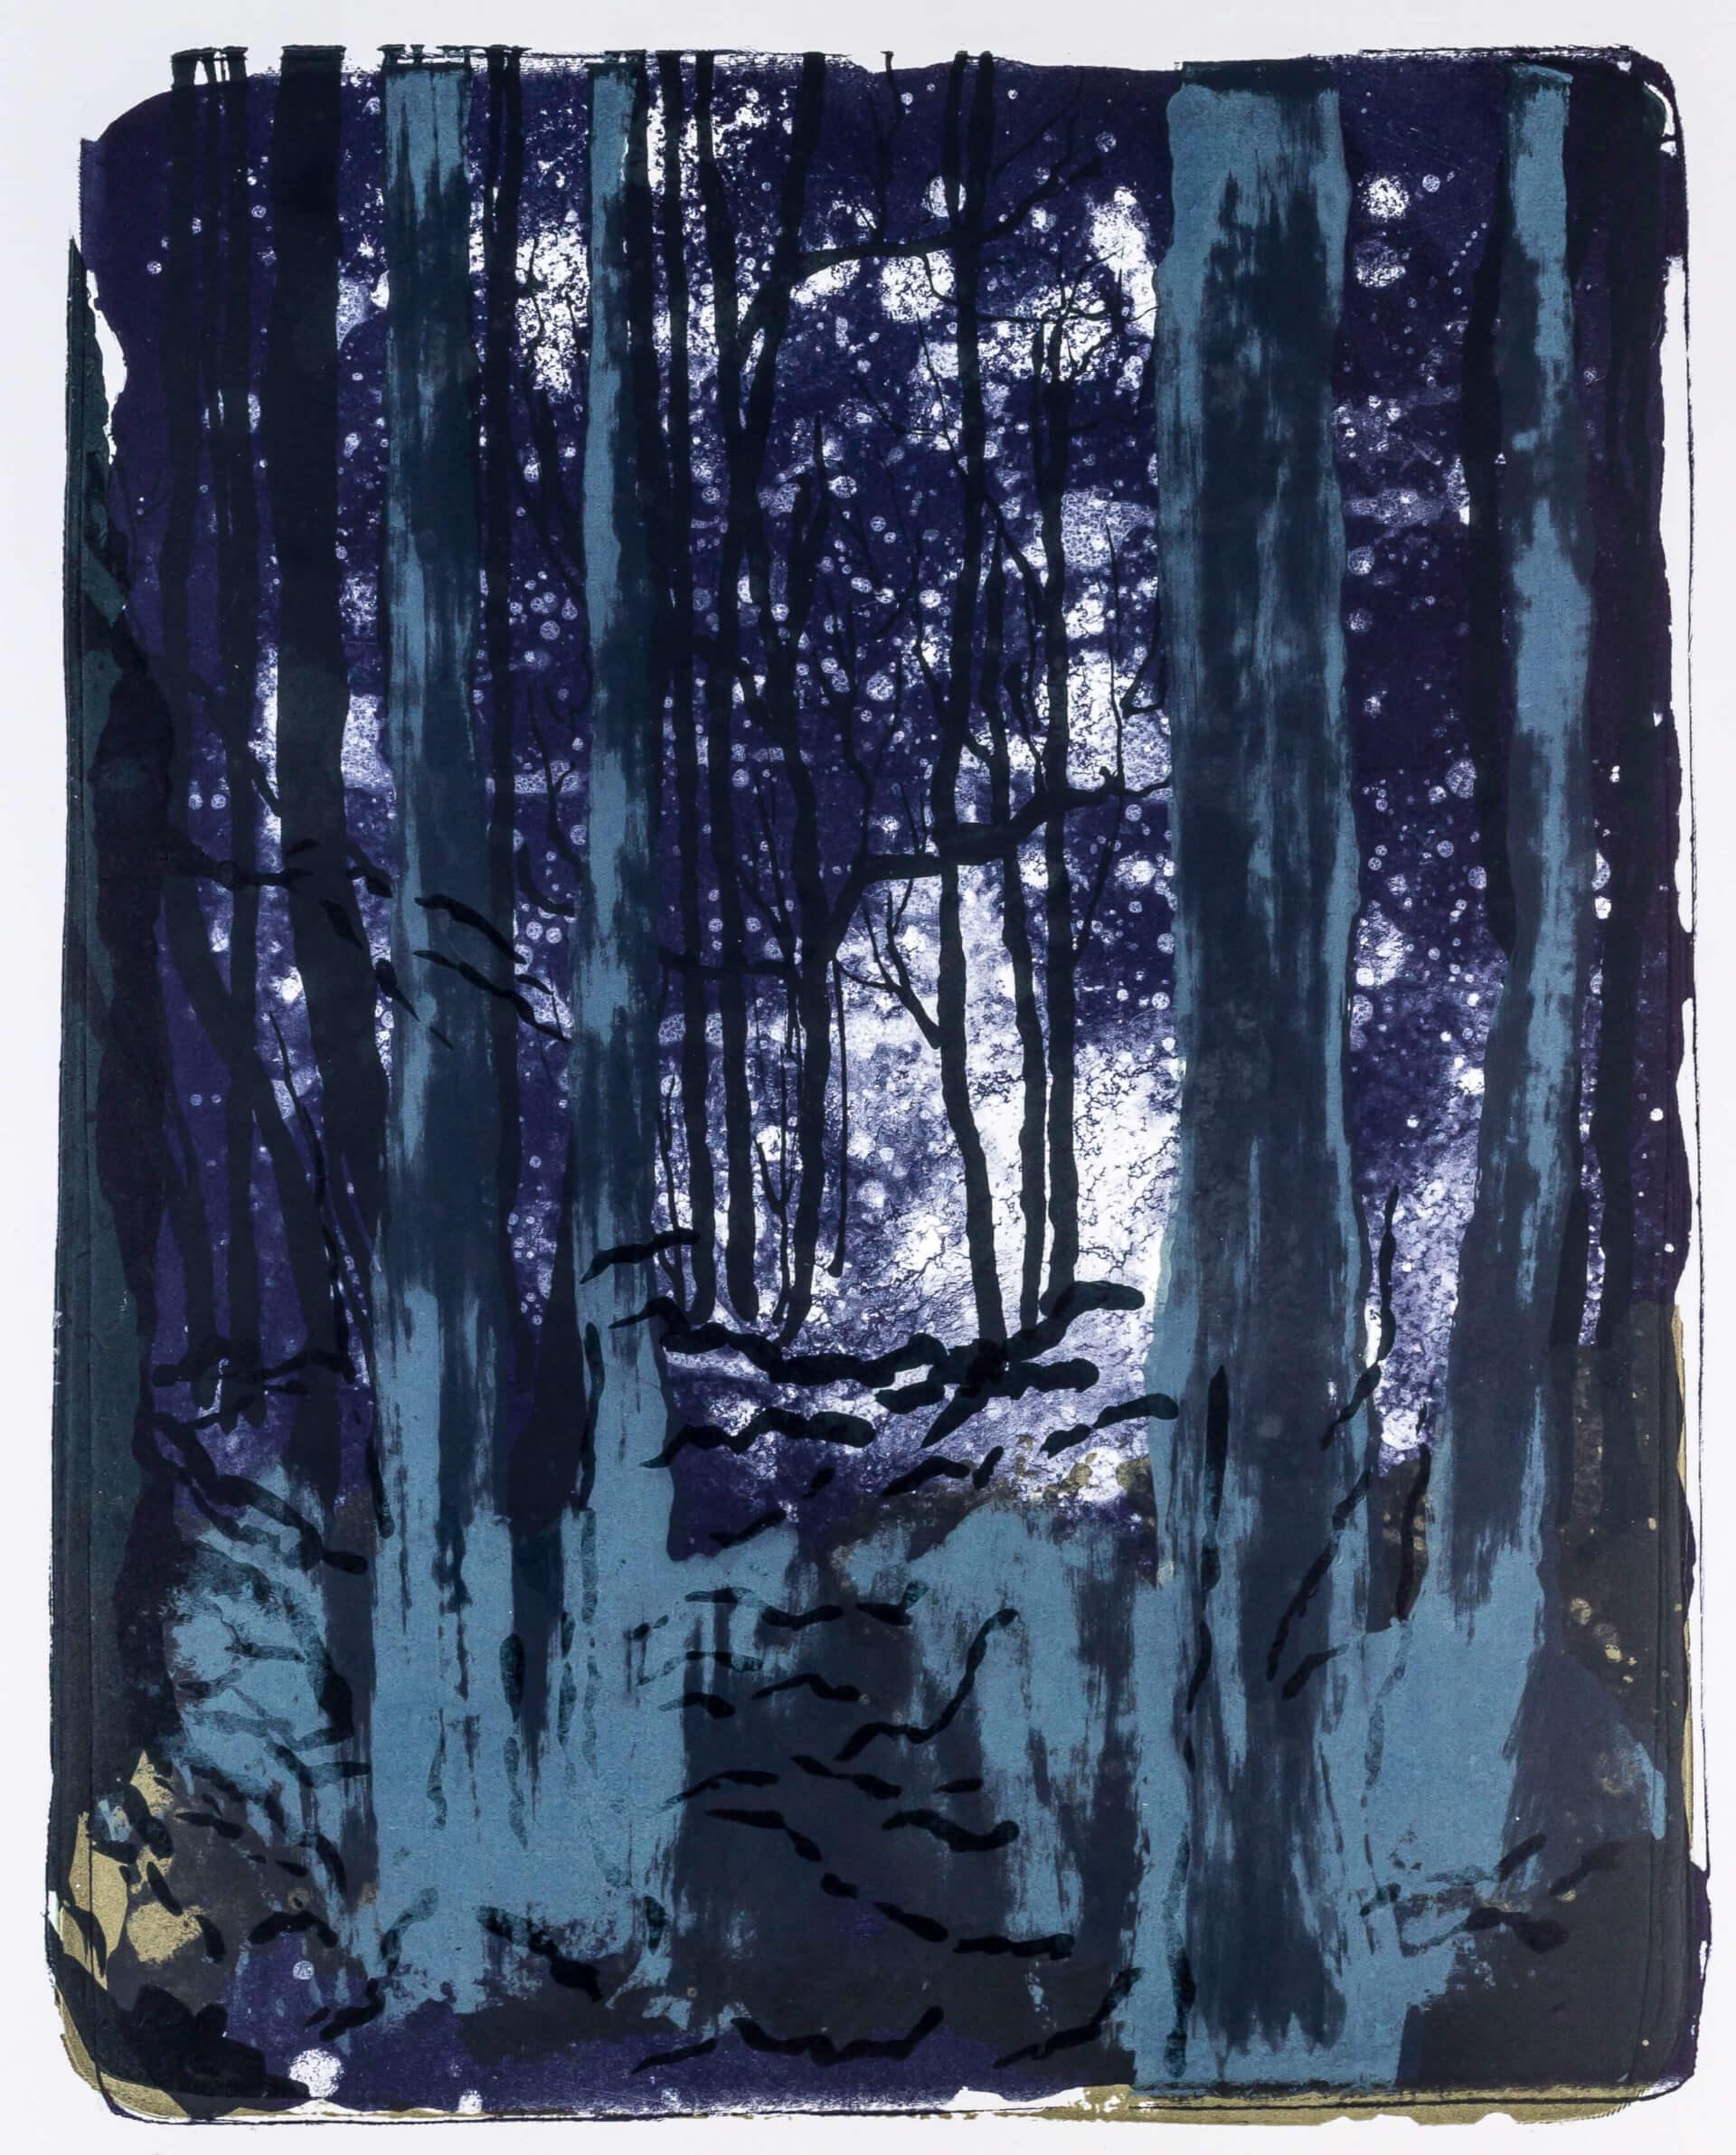 Katharina Albers, Wald X-IX, 2015, Farblithographie, Unikat, 50×40 cm